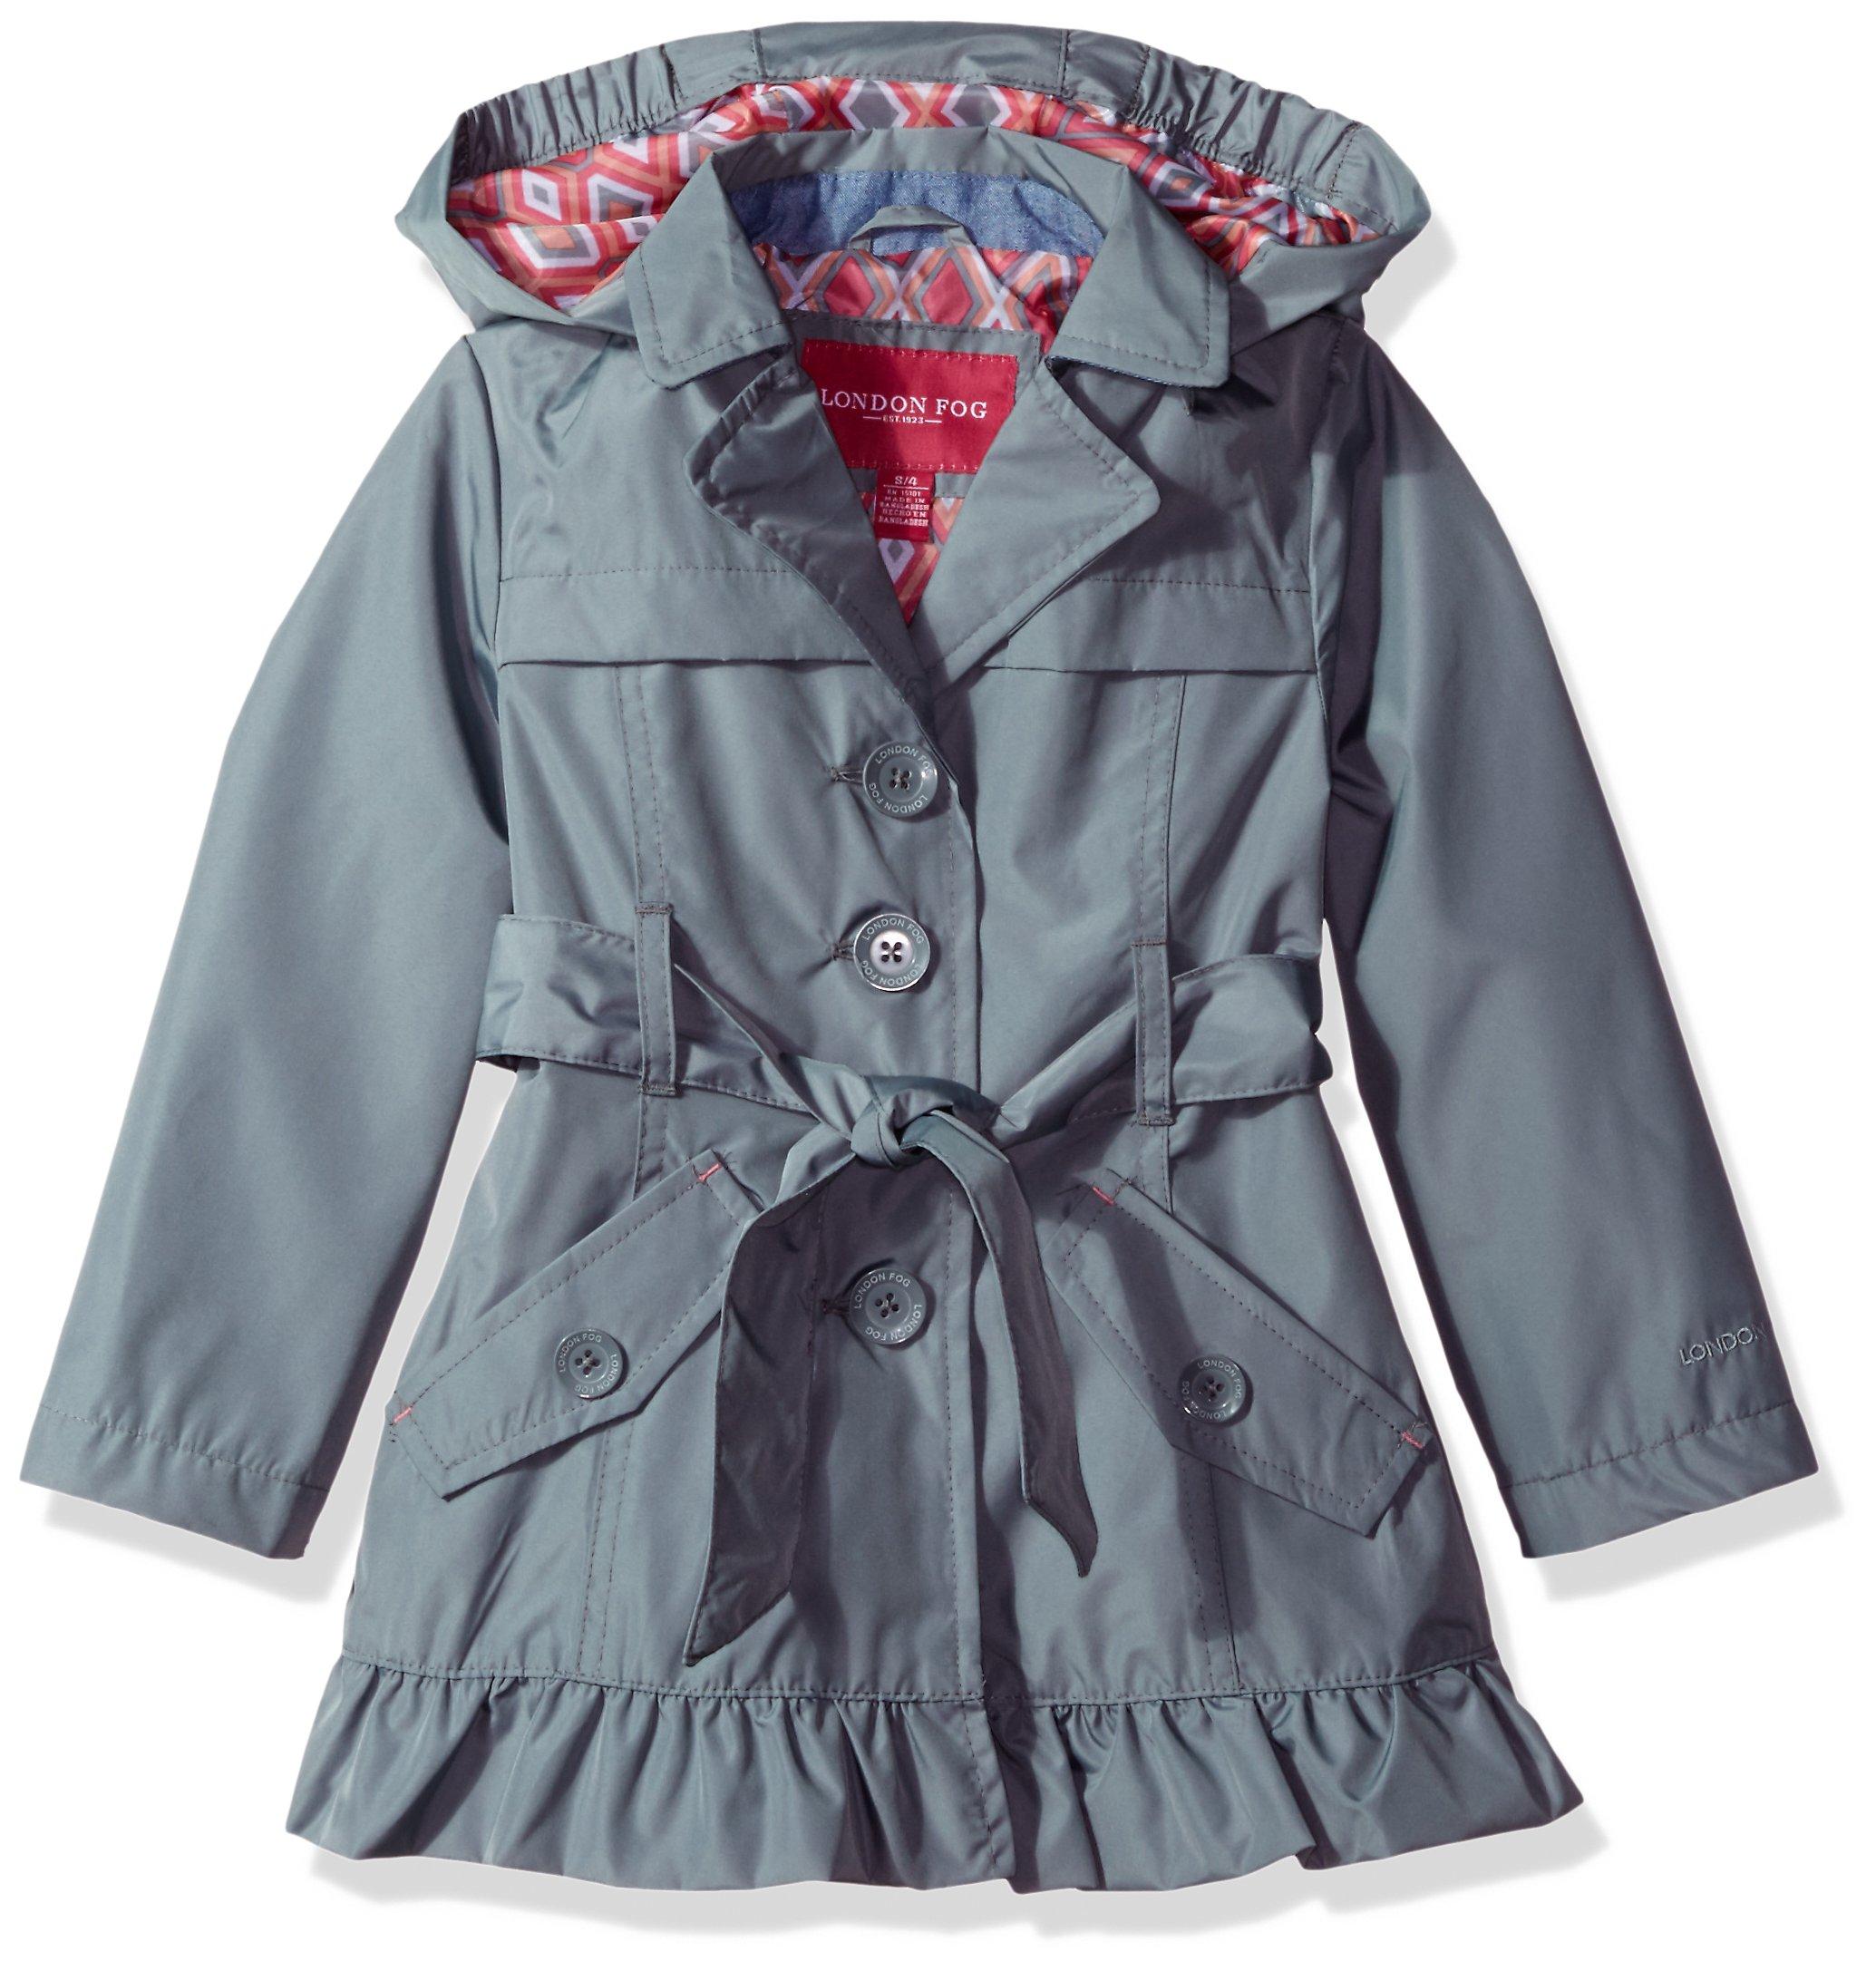 London Fog Little Girls' Single Breasted Trench Coat, Summer Grey, 6X